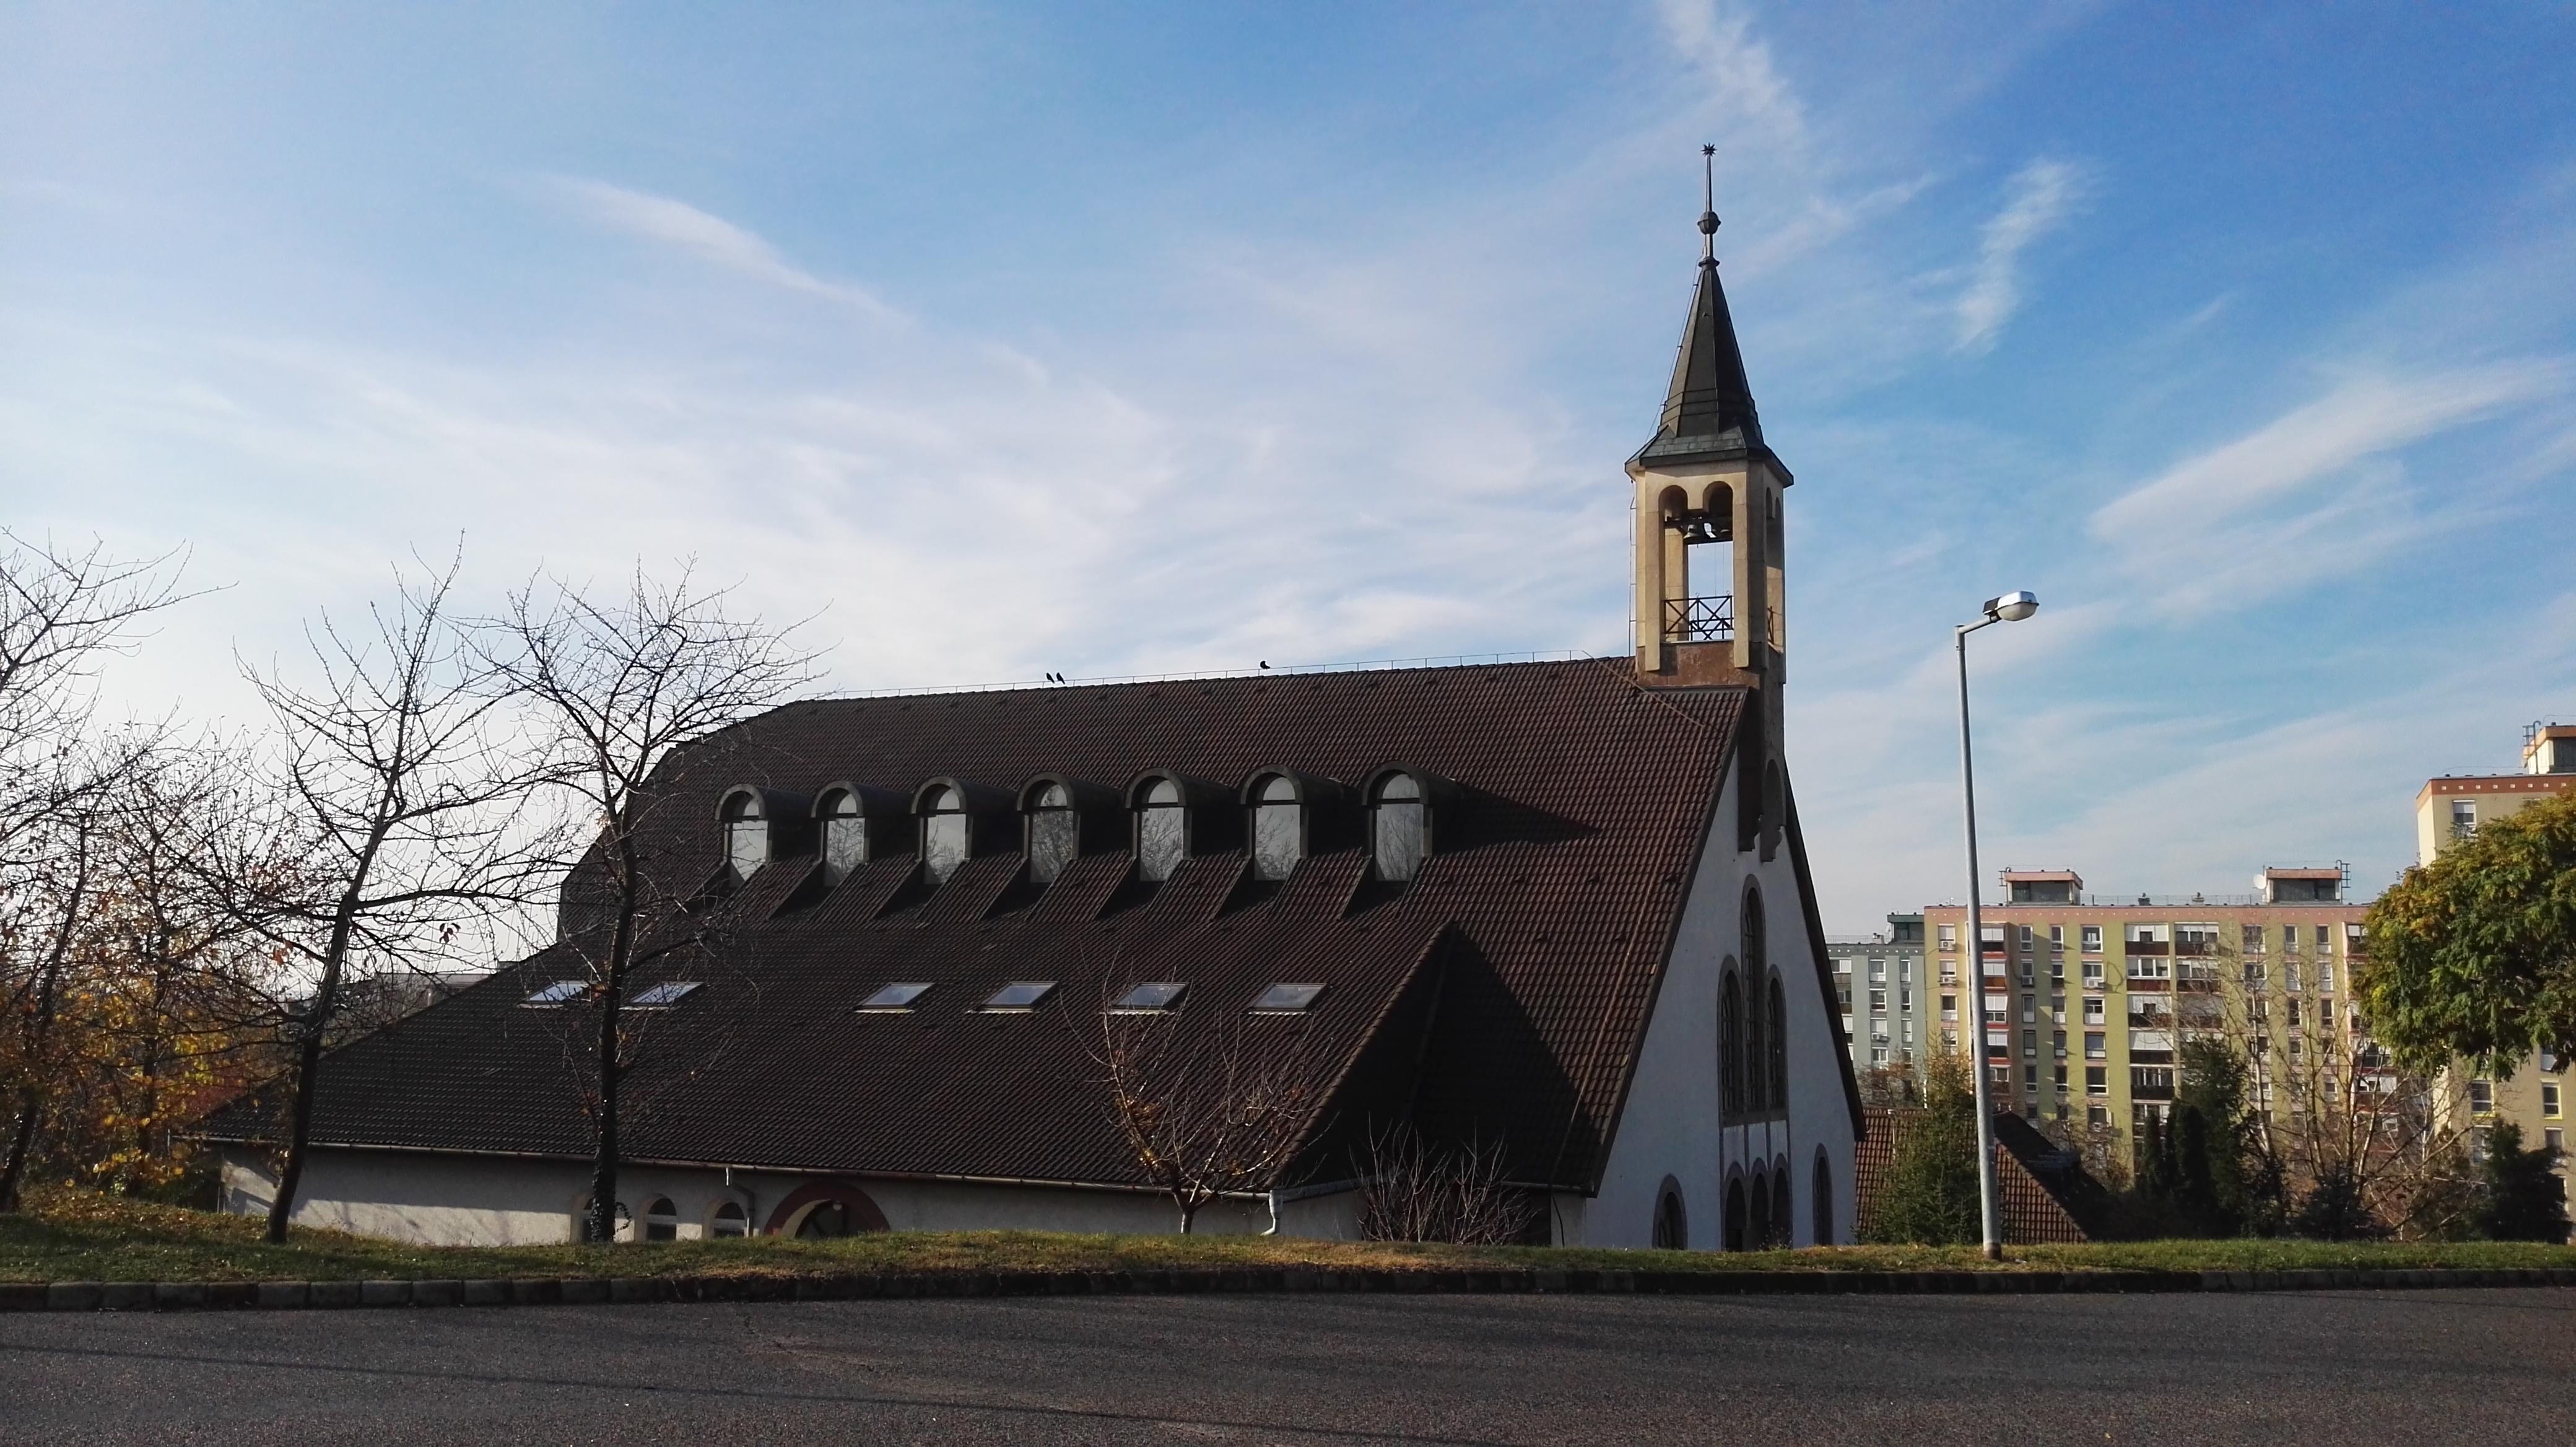 Pecs Kertvarosi Reformatus Templom Wikipedia